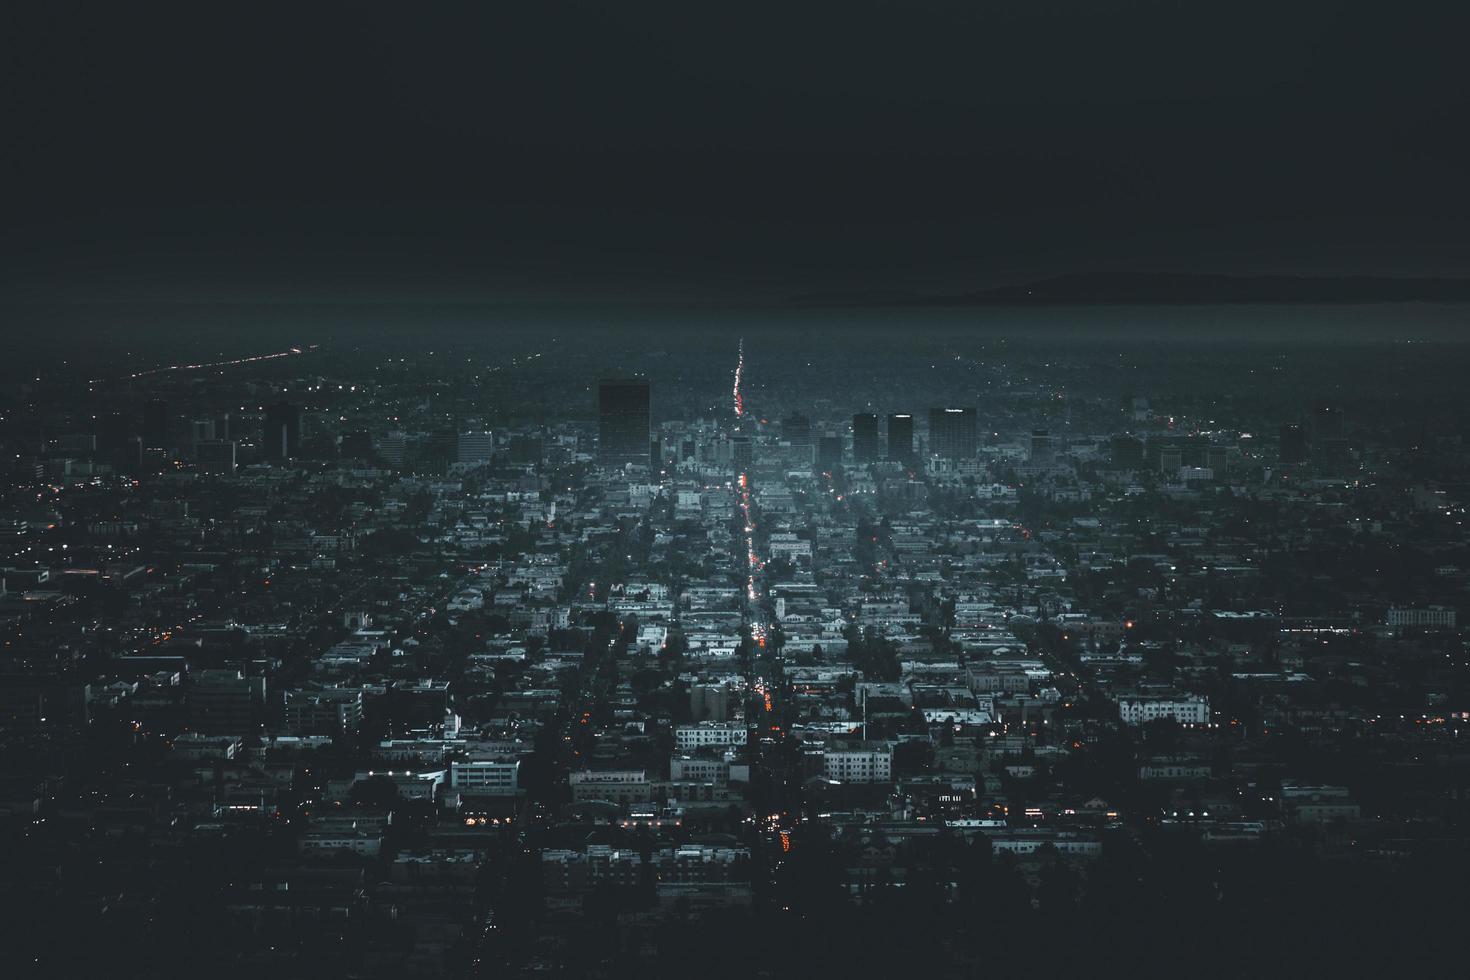 View of city at night photo